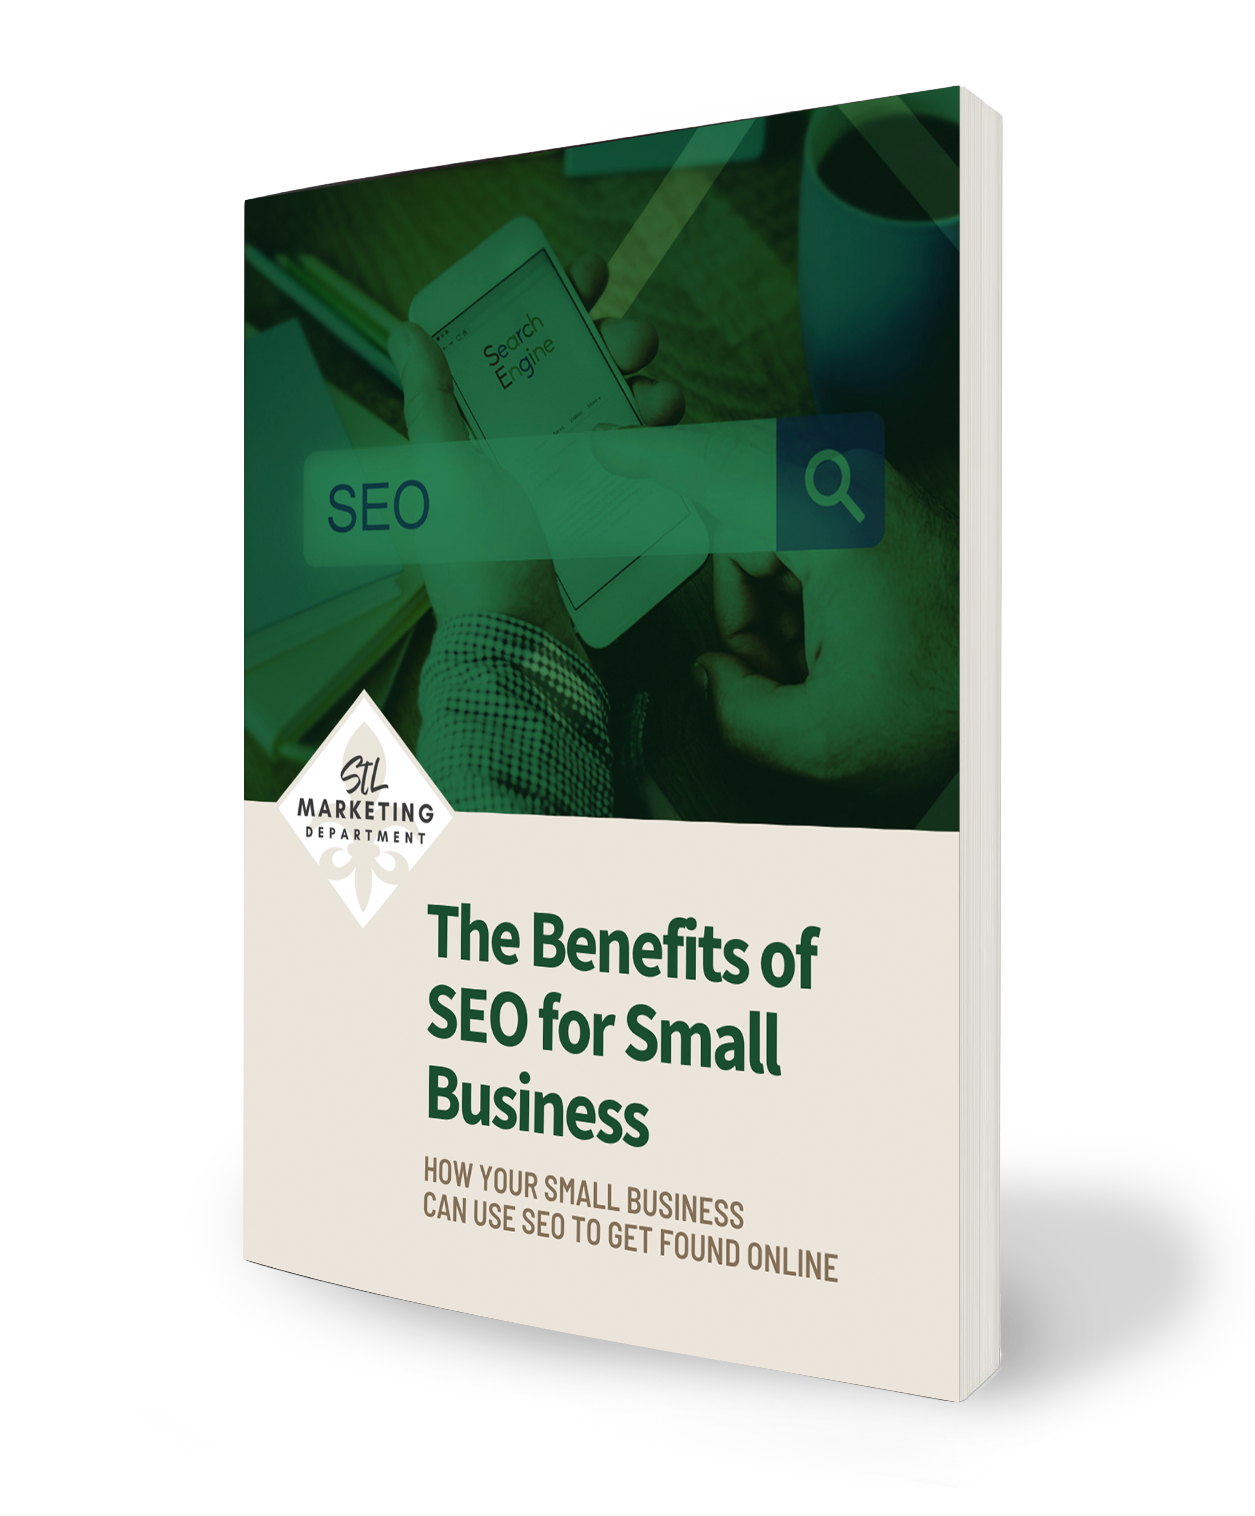 STLMD eBook Thumbnail - SEO Benefits for Small Biz (1)